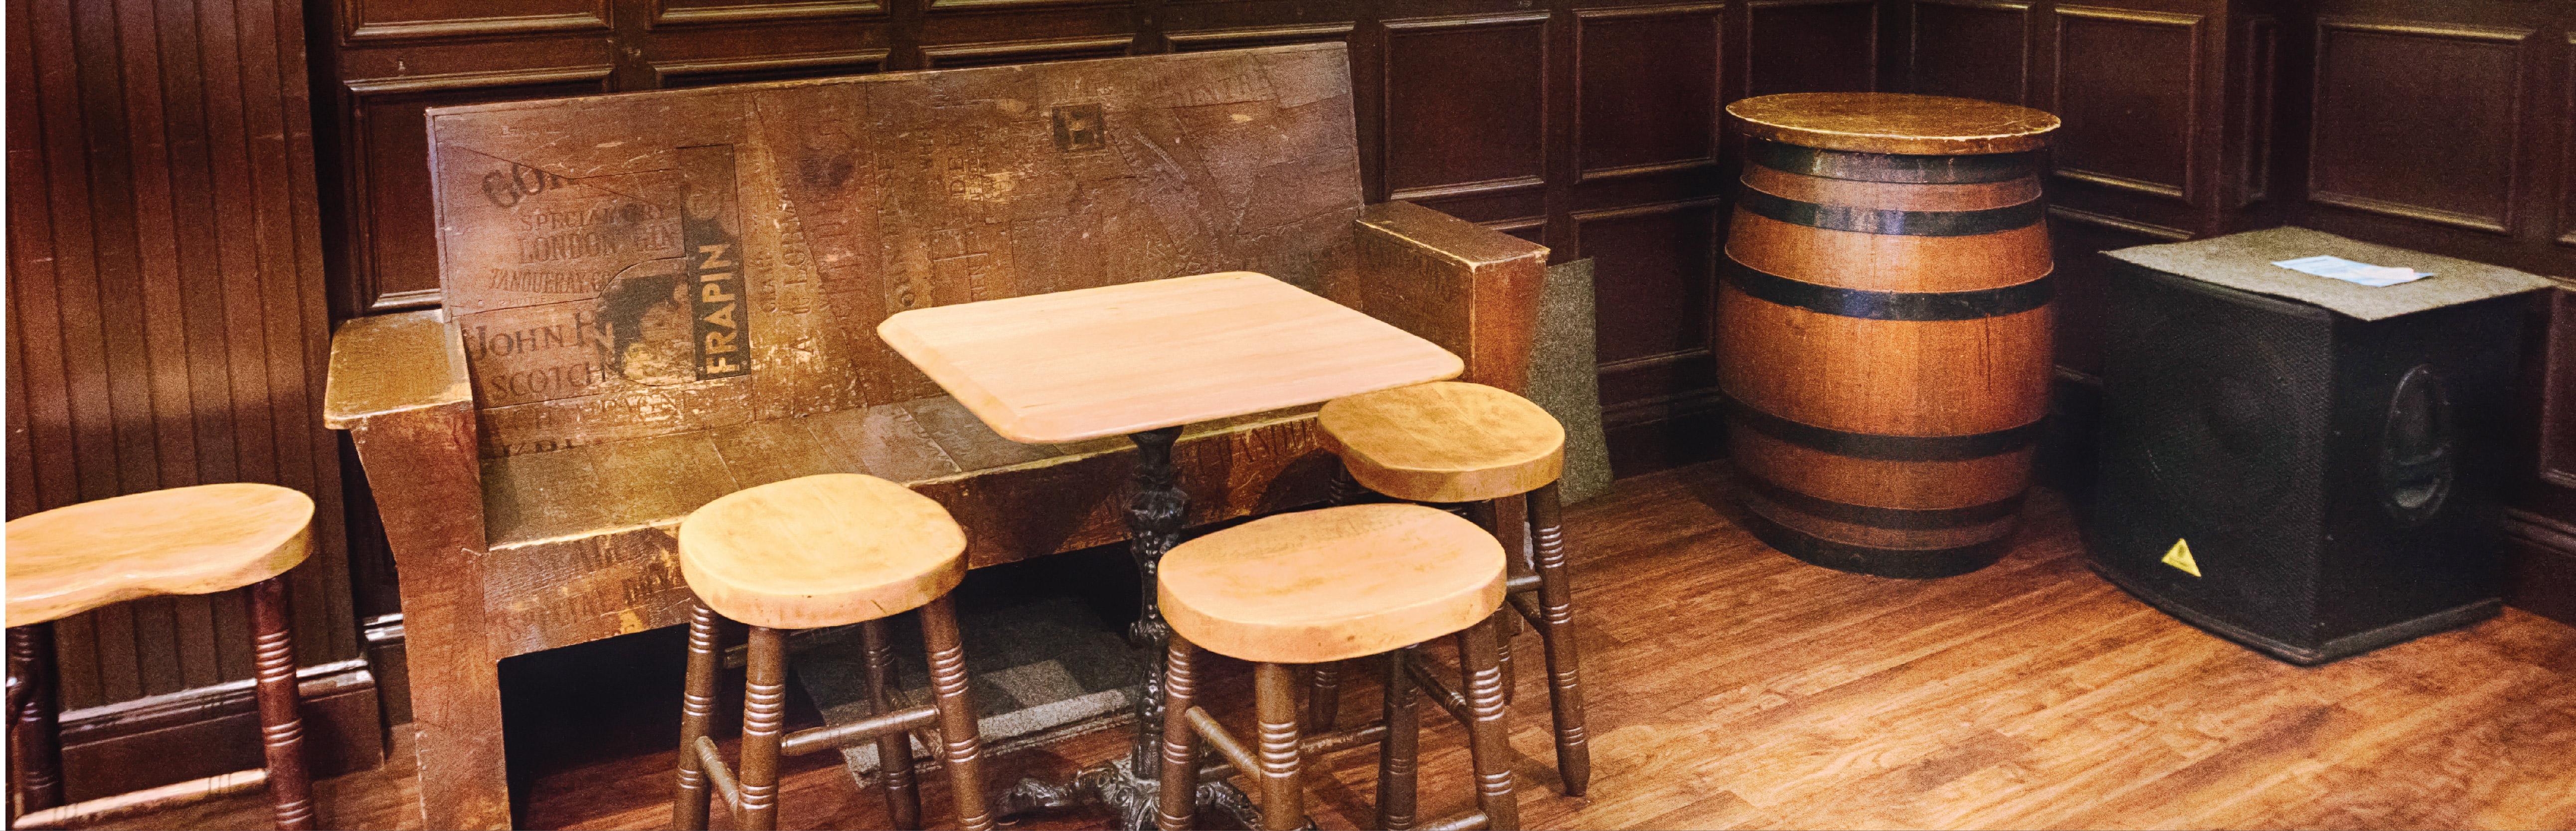 Randalls Kitty O'Shea's Pub Jersey